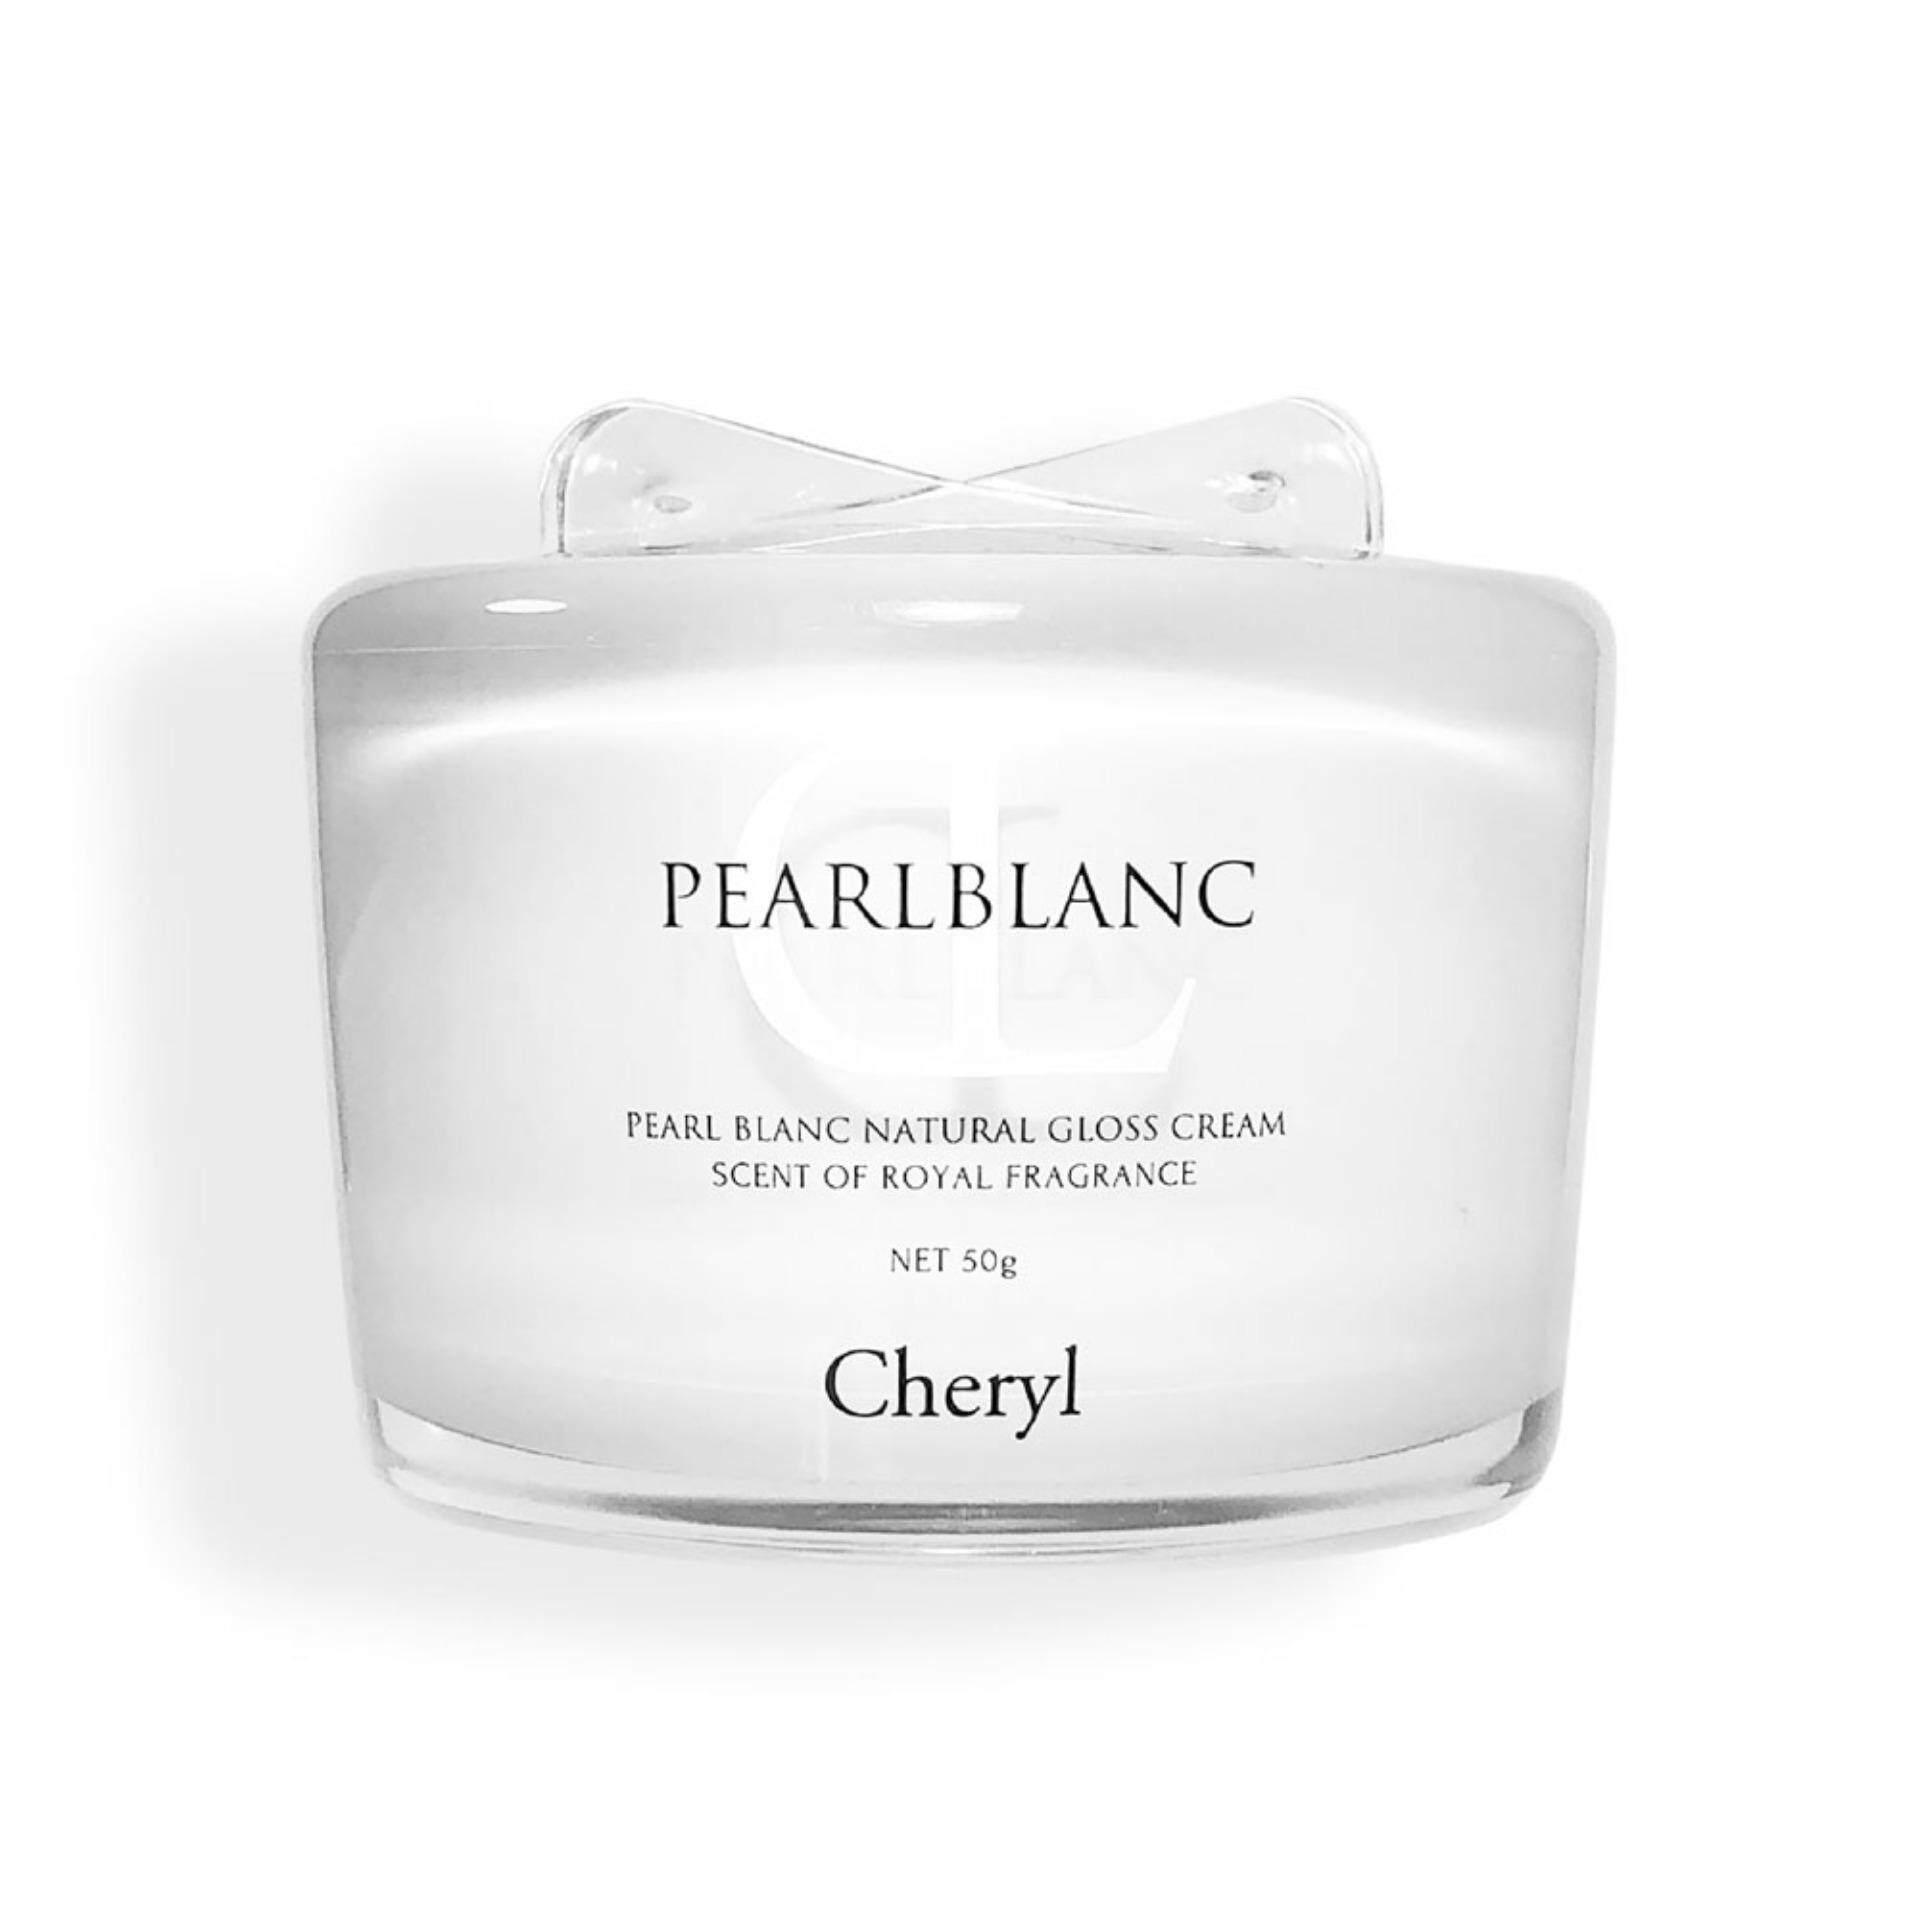 Cheryl - Pearlblanc Natural Gloss Skin Tone Up Cream 50g 1012 By Shinsekai.